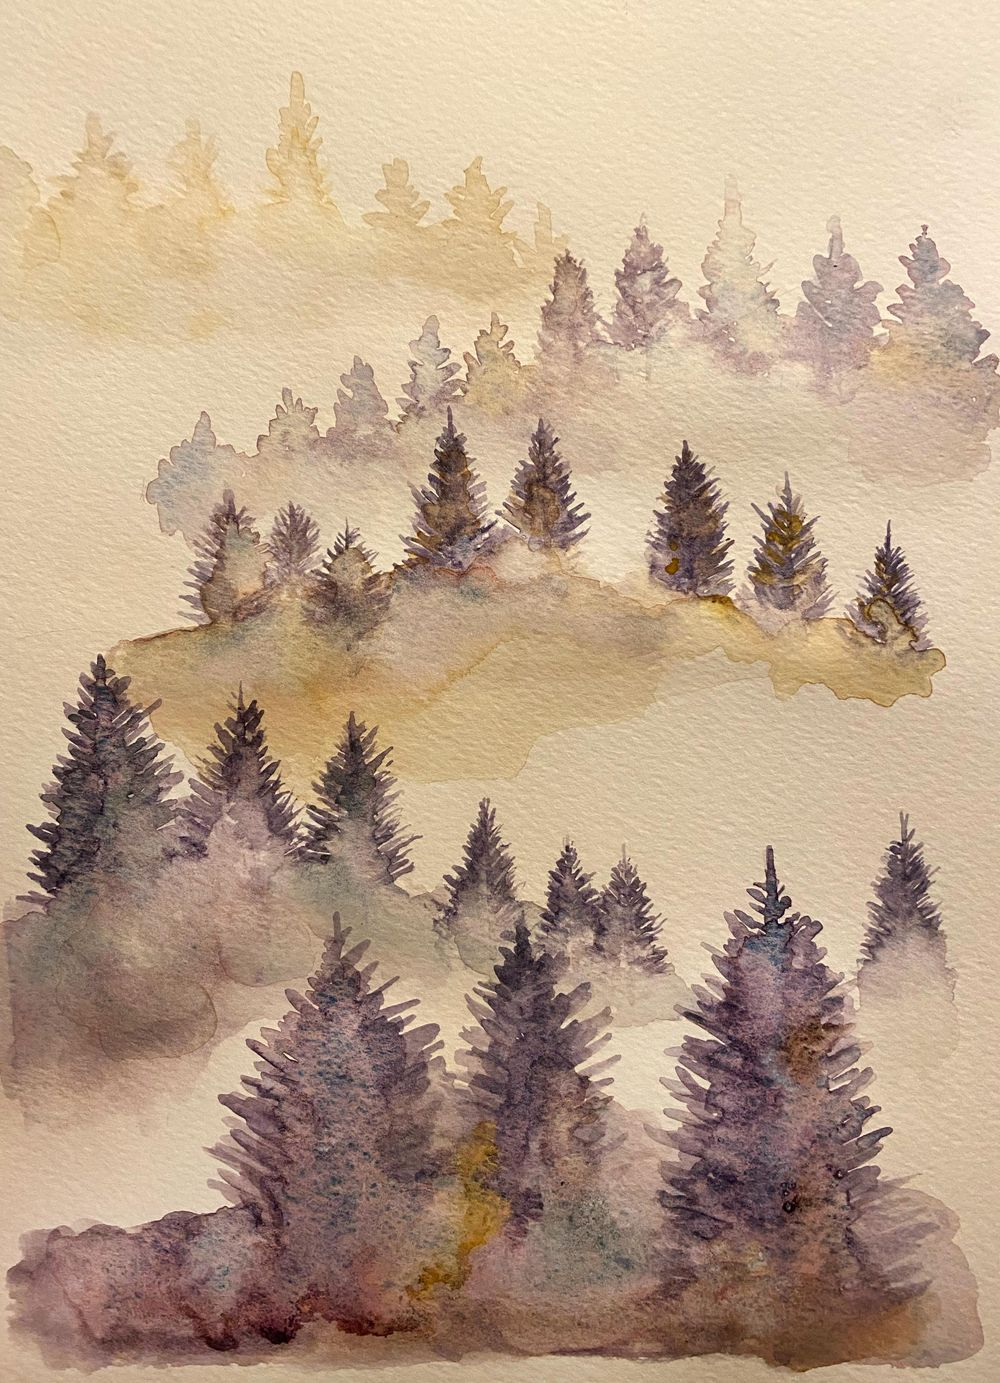 Misty Tree Landscape - image 2 - student project